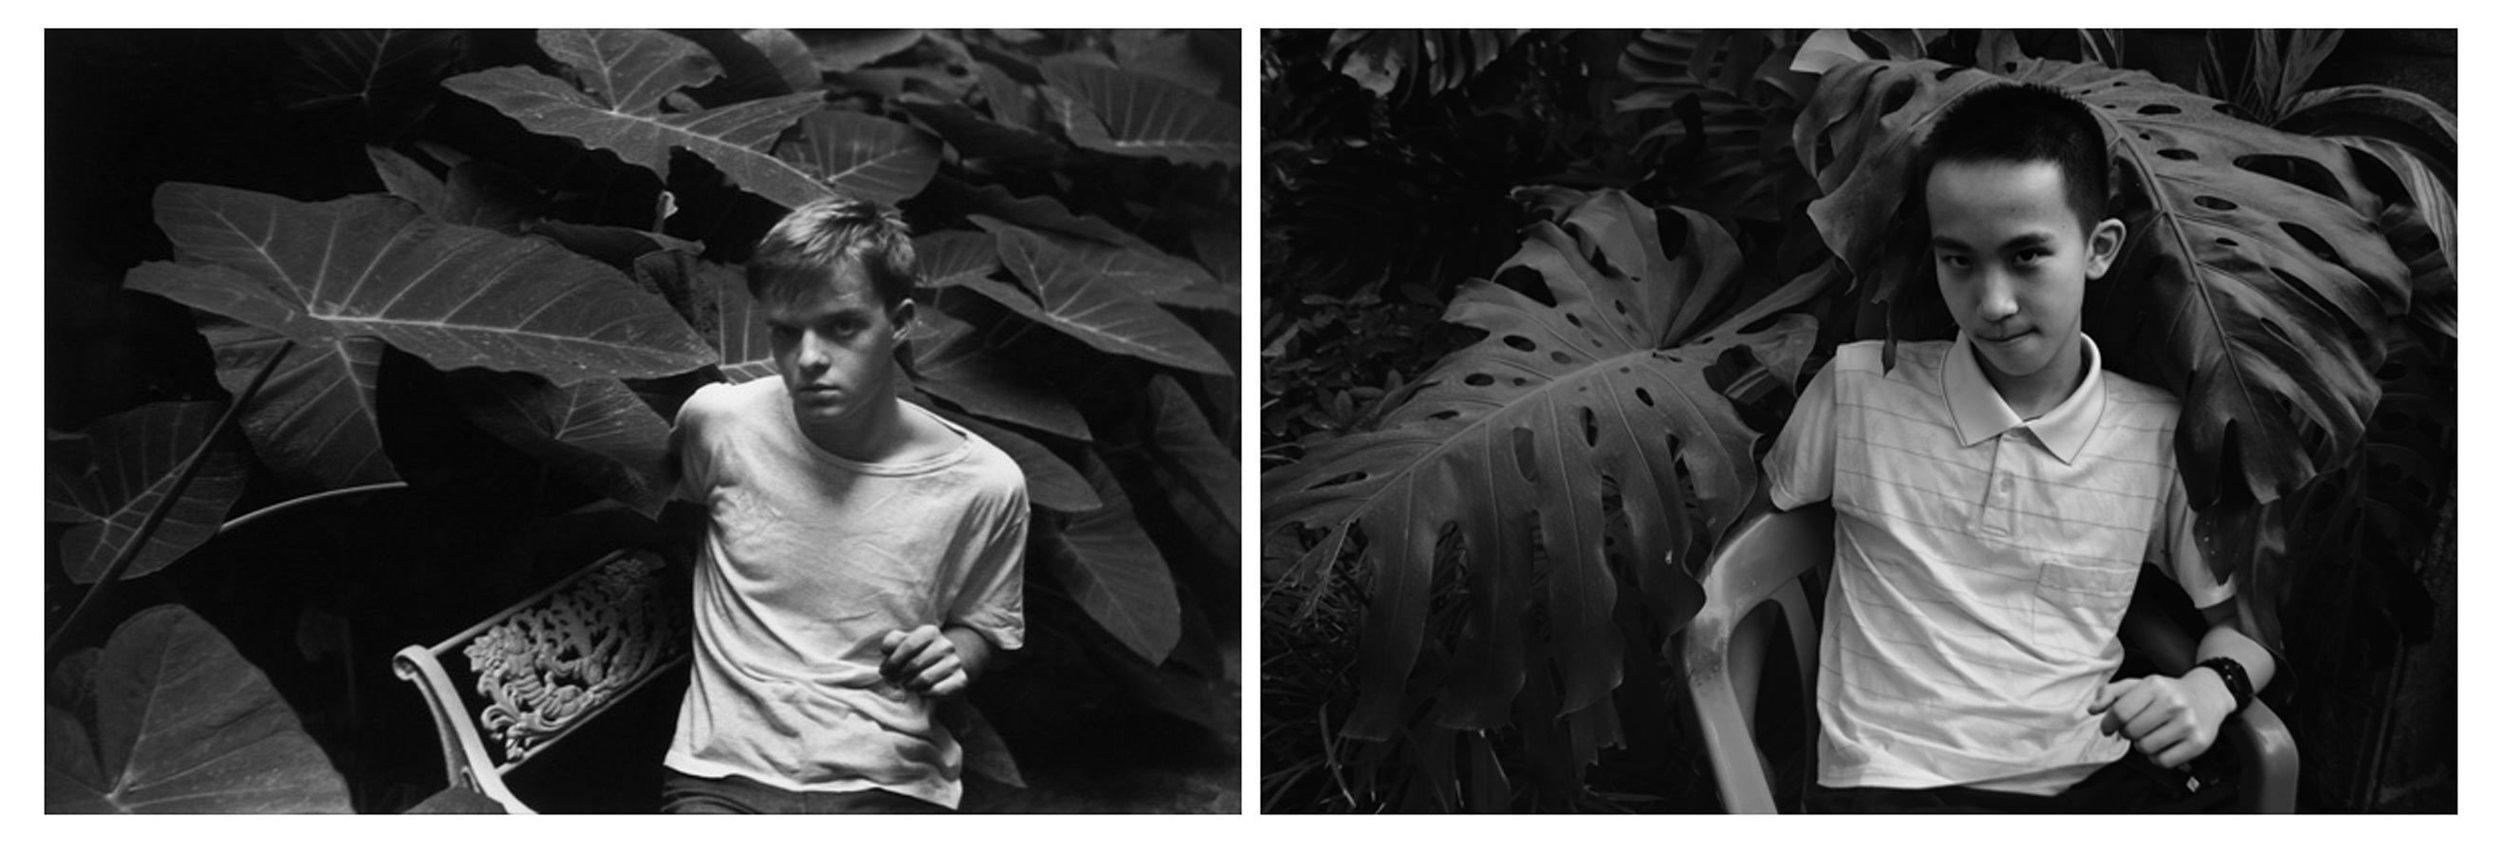 Cartier-Bresson-Homage_1.jpg